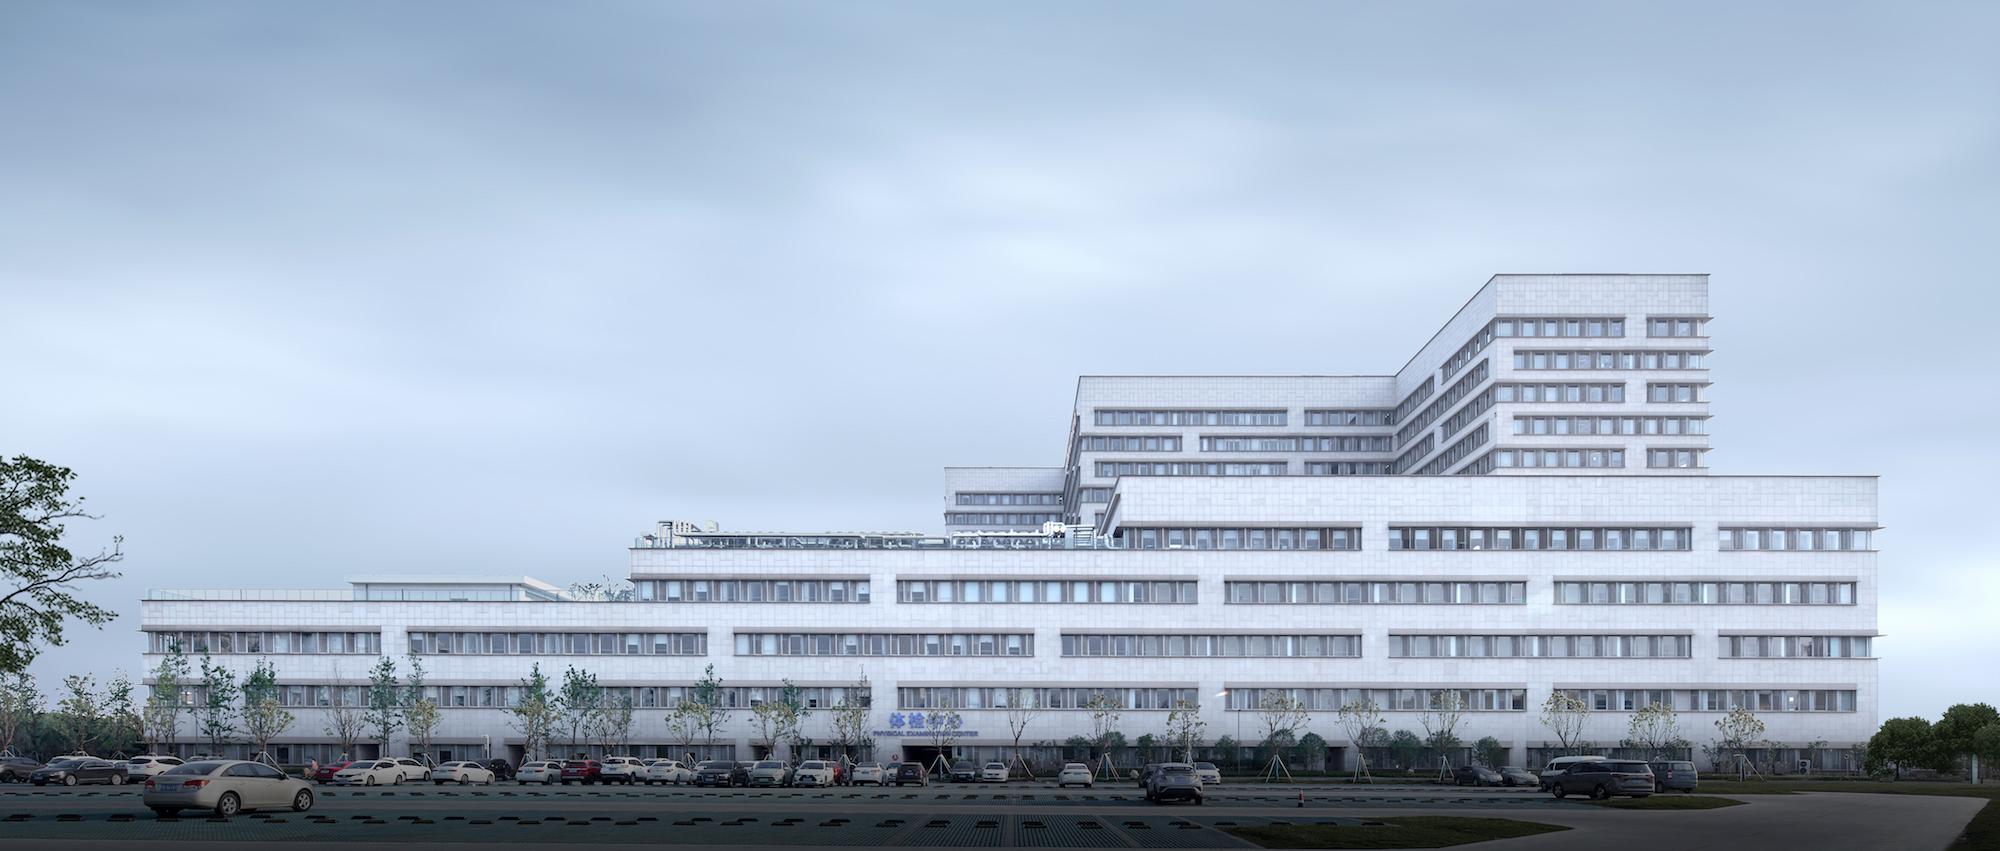 LEMANARC 瑞士瑞盟设计 / 苏州市独墅湖医院